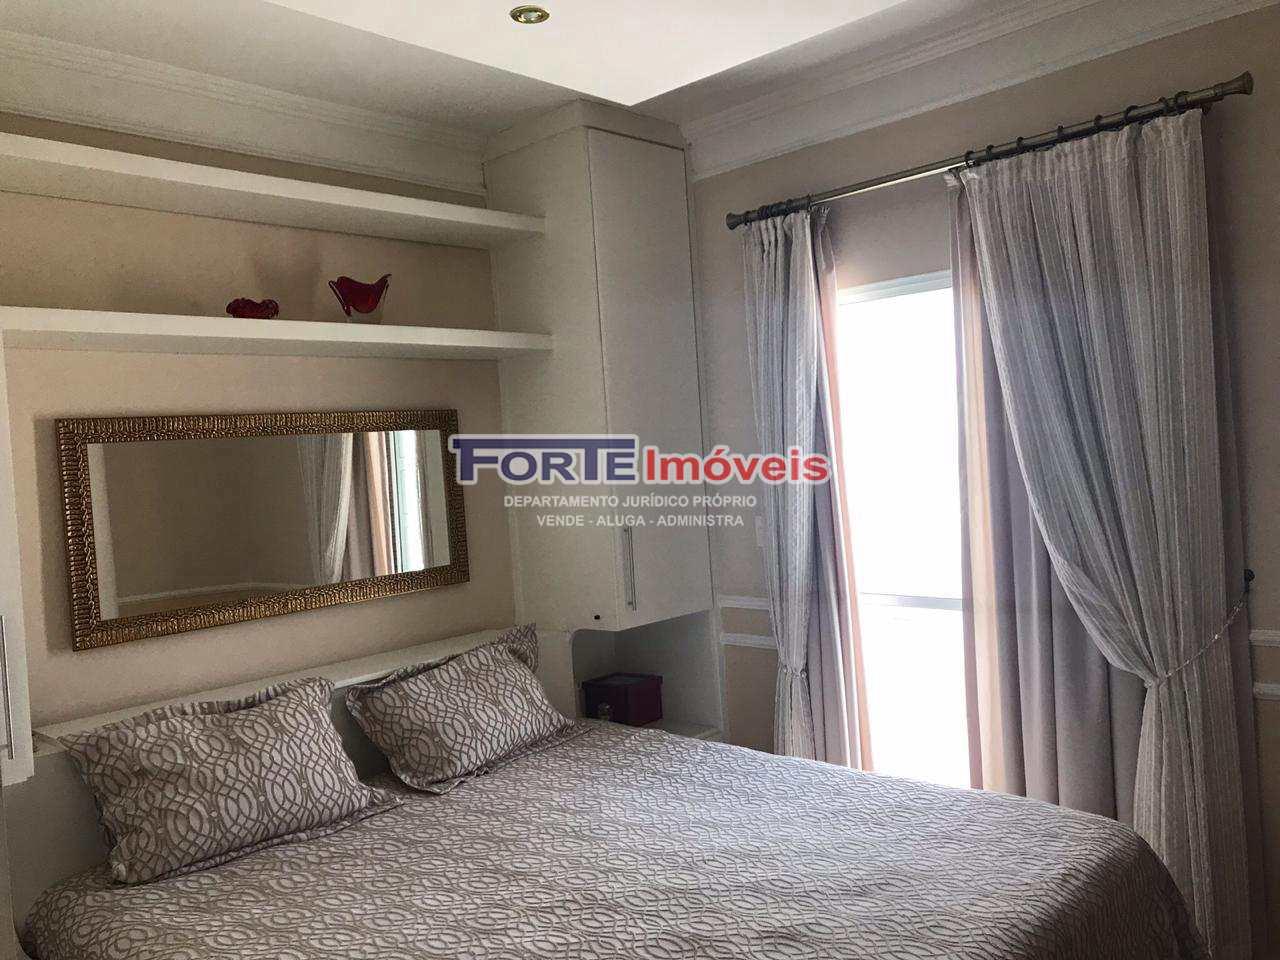 Sobrado com 4 dorms, Jardim São Paulo(Zona Norte), São Paulo - R$ 1.22 mi, Cod: 42903626